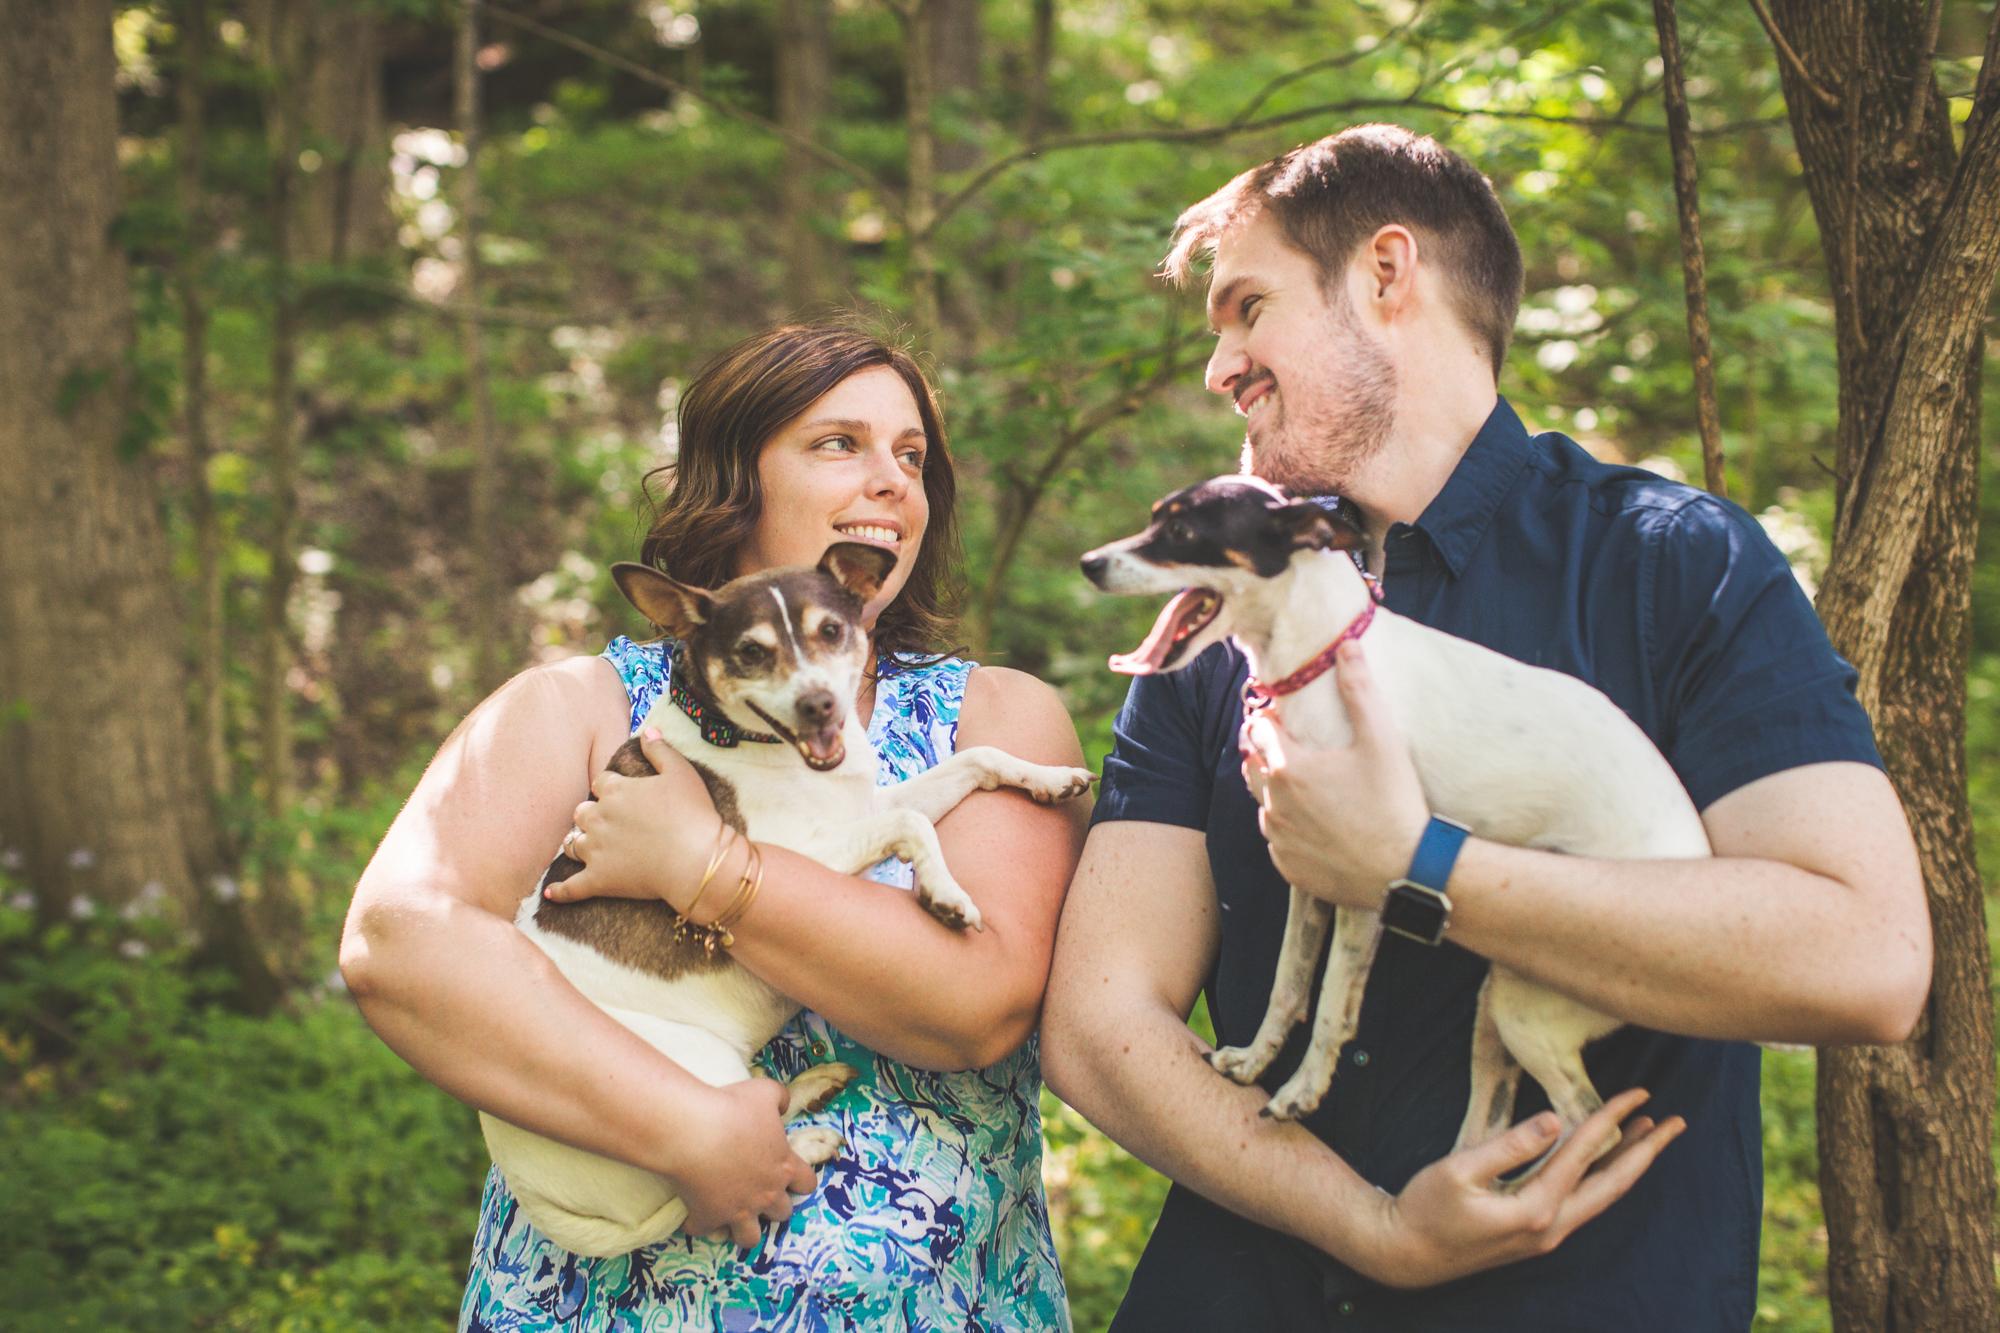 20180507-BridgetAdam-Engagement-blog-1.jpg